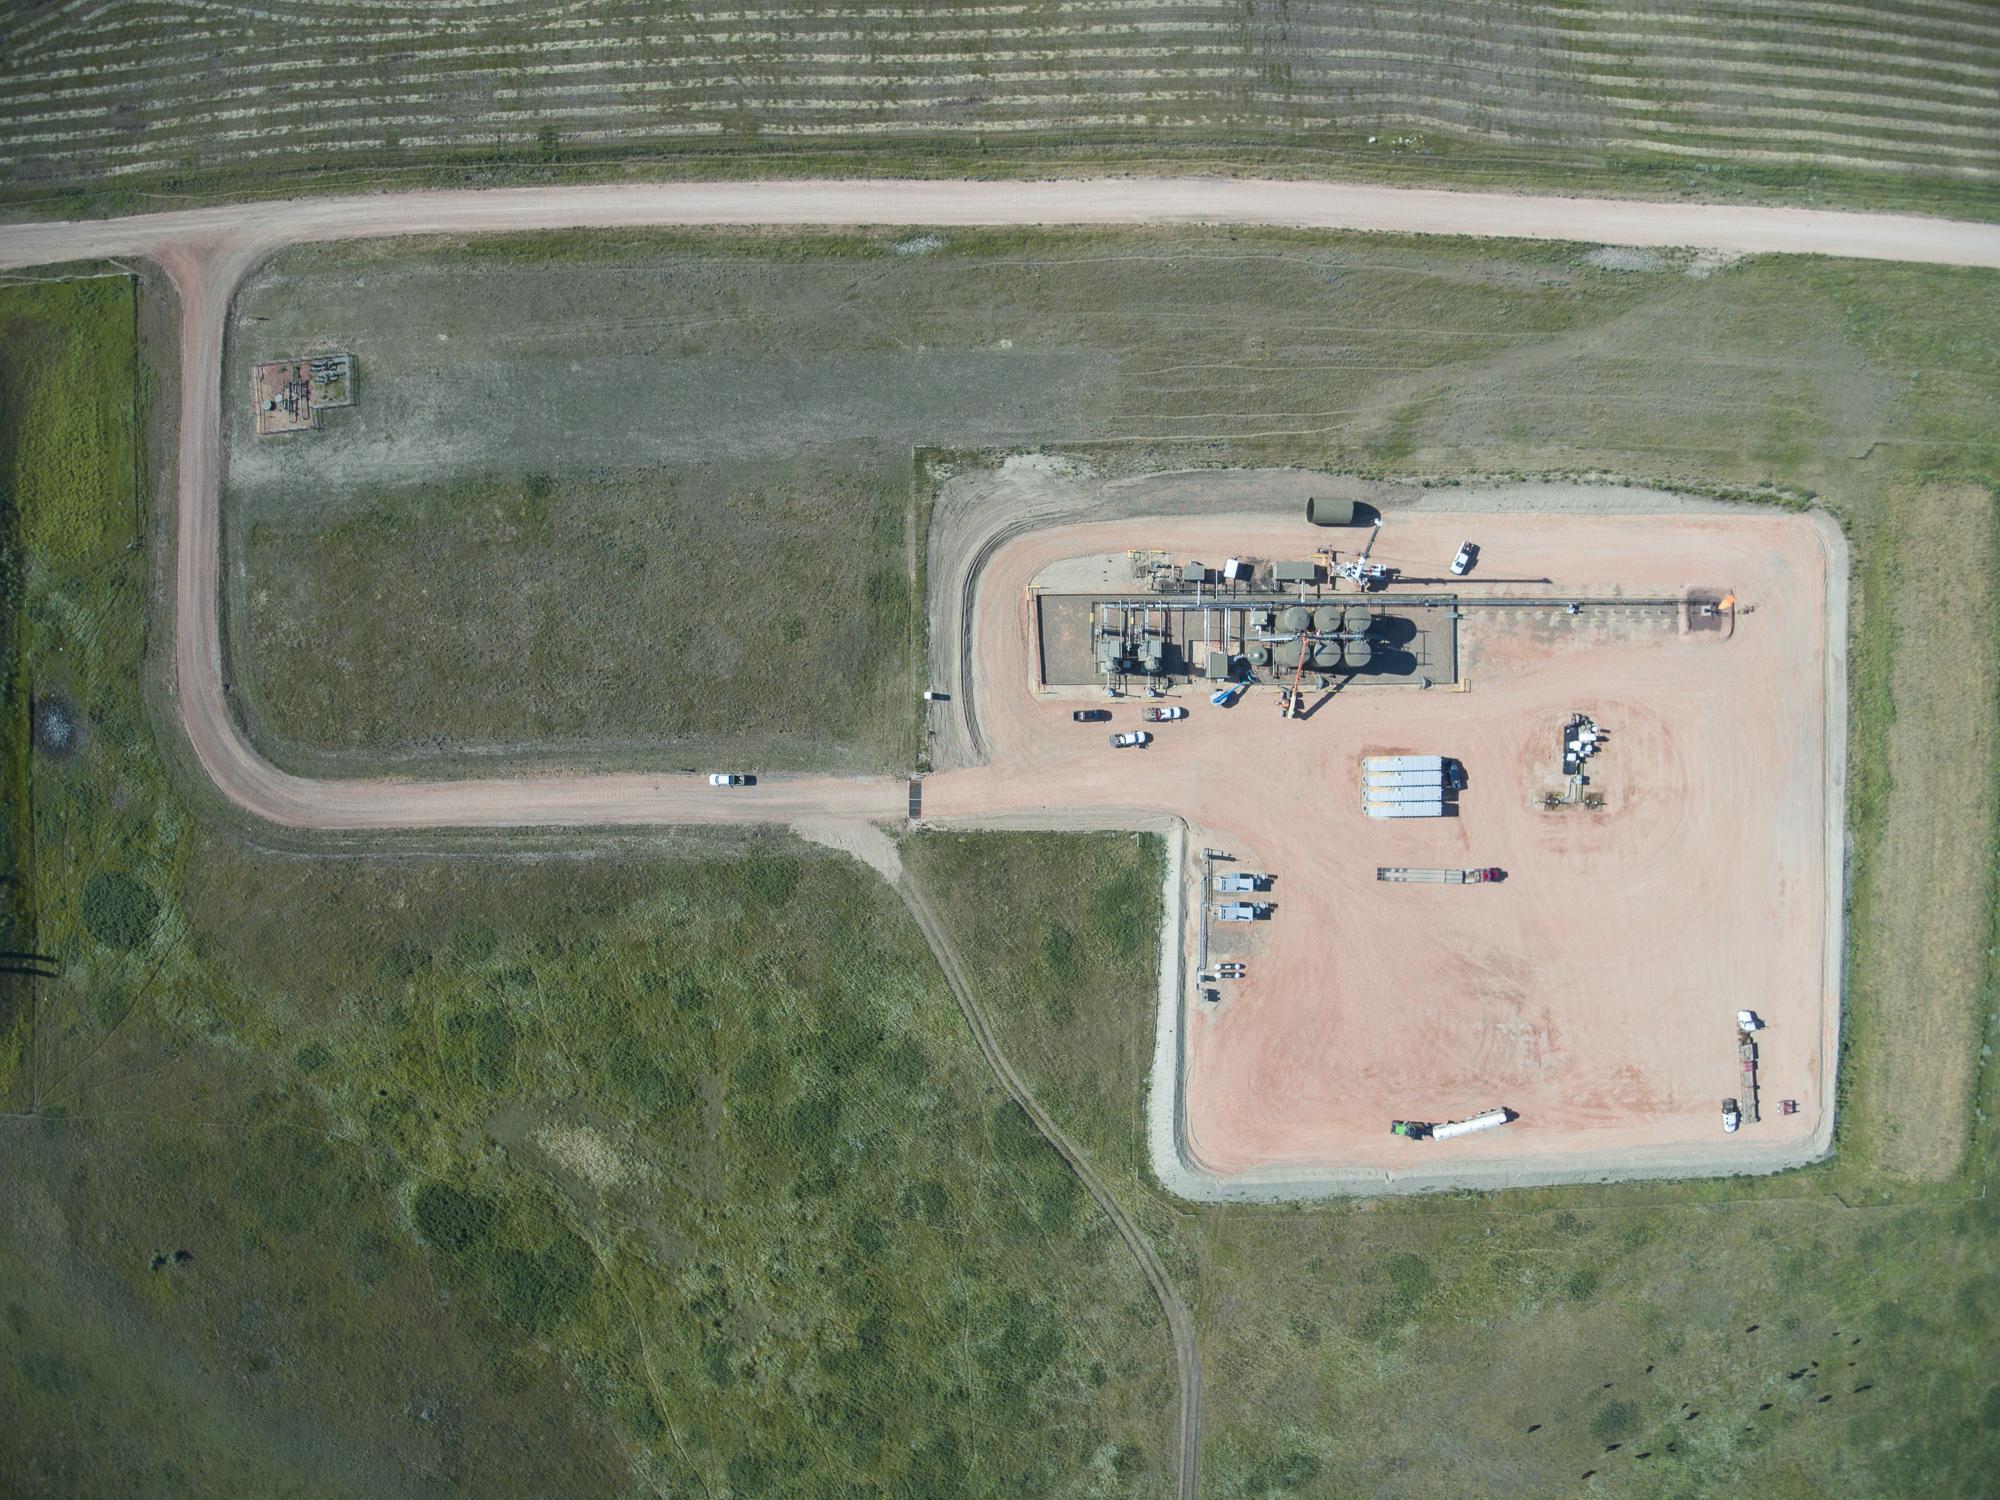 Drone Aerial 1.jpg